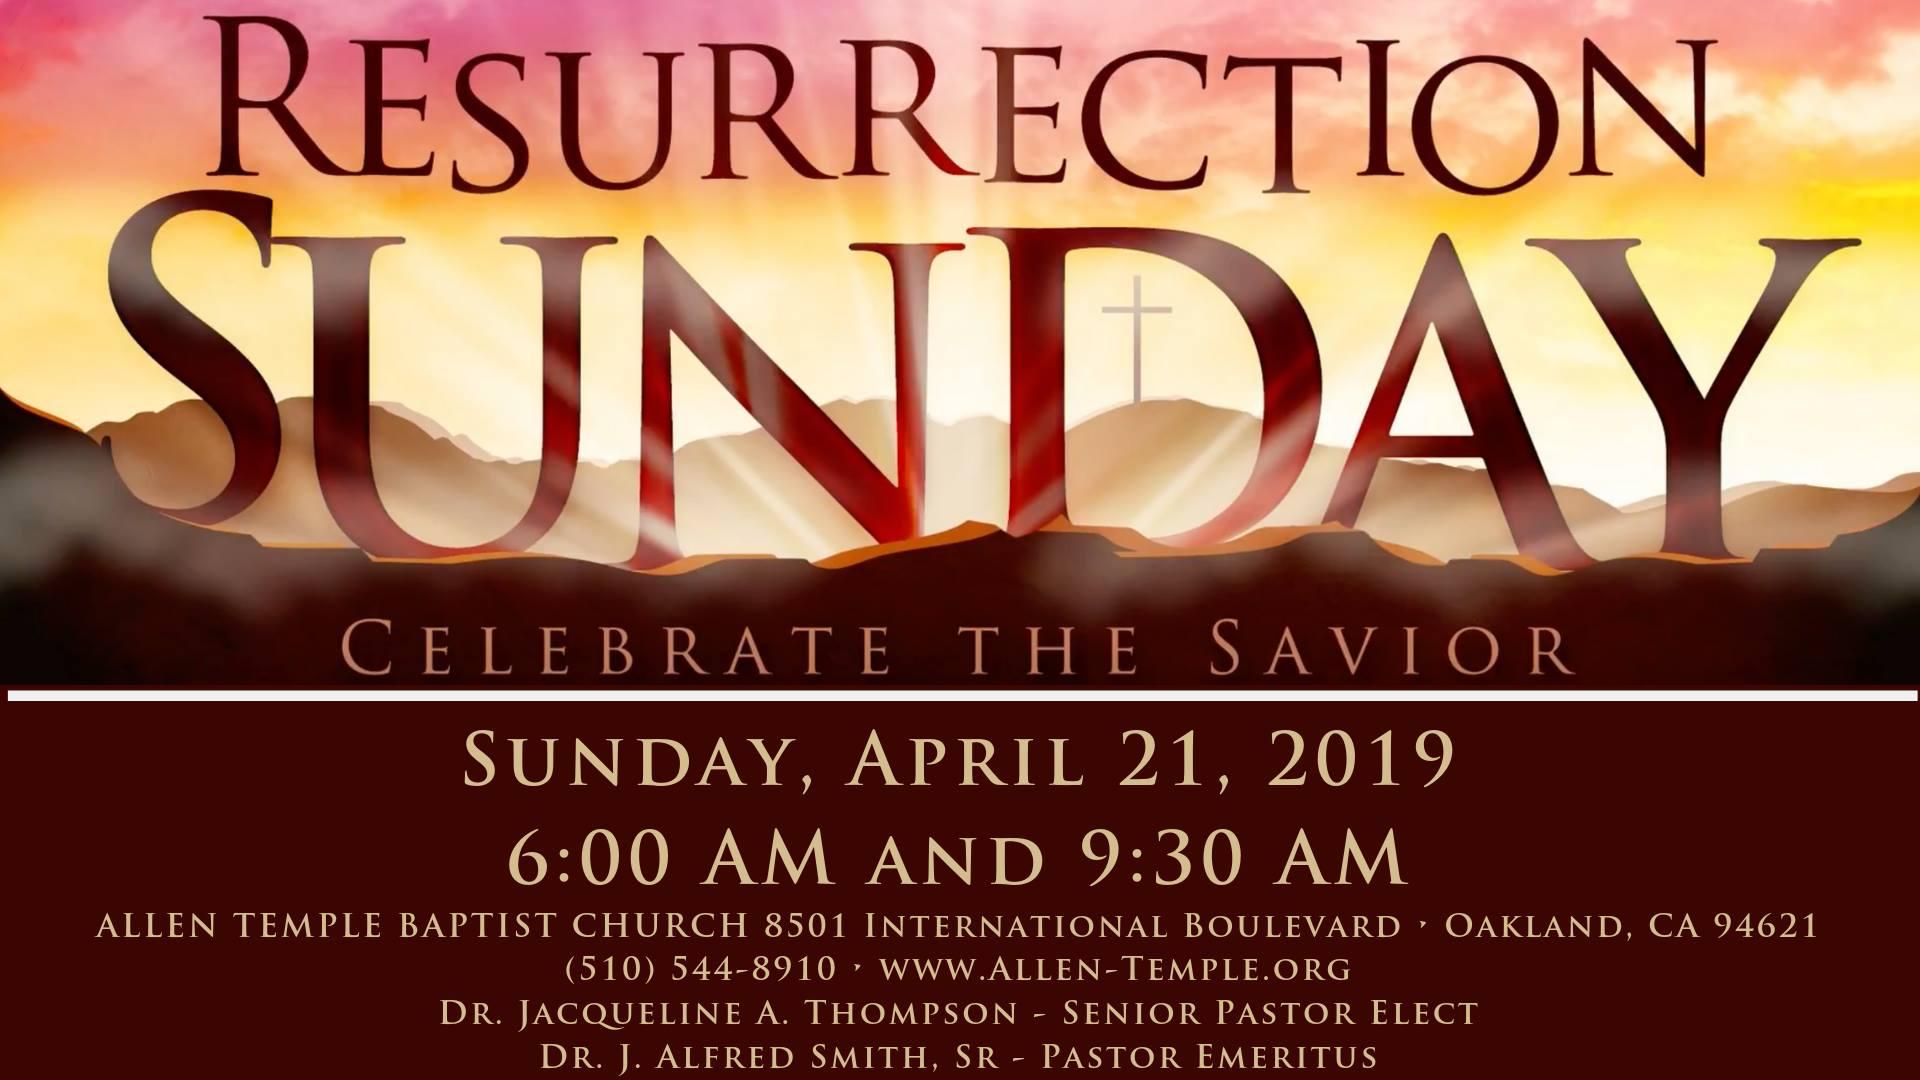 Allen Temple Baptist Church Resurrection Sunrise Service 2019